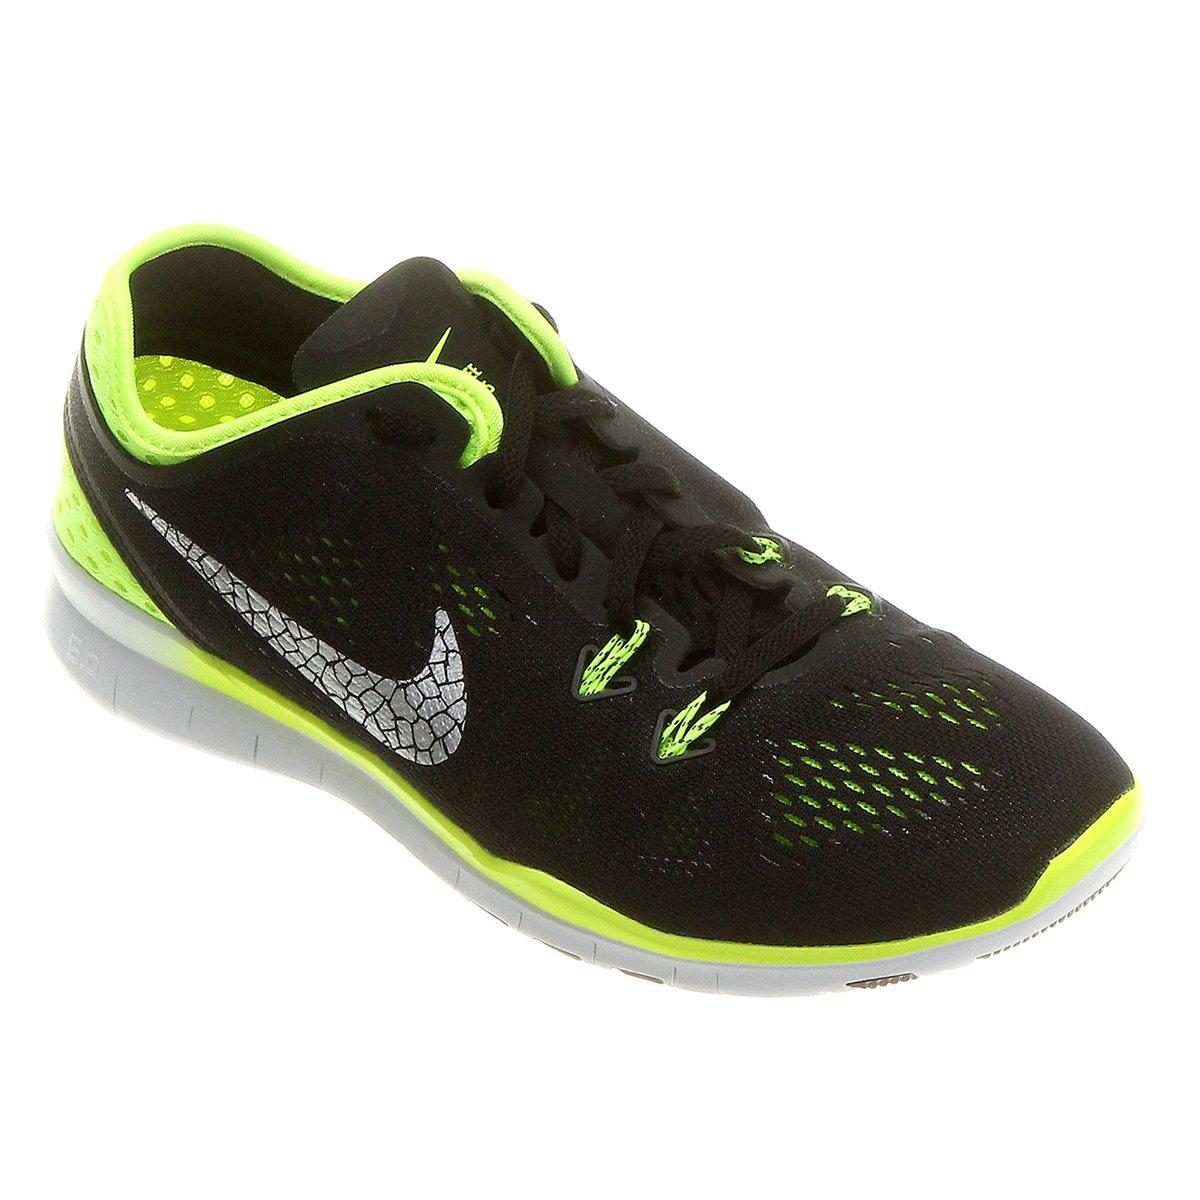 Tênis Nike Free 5.0 TR Fit 5 Breathe Feminino - Compre Agora  ad20c391dbb